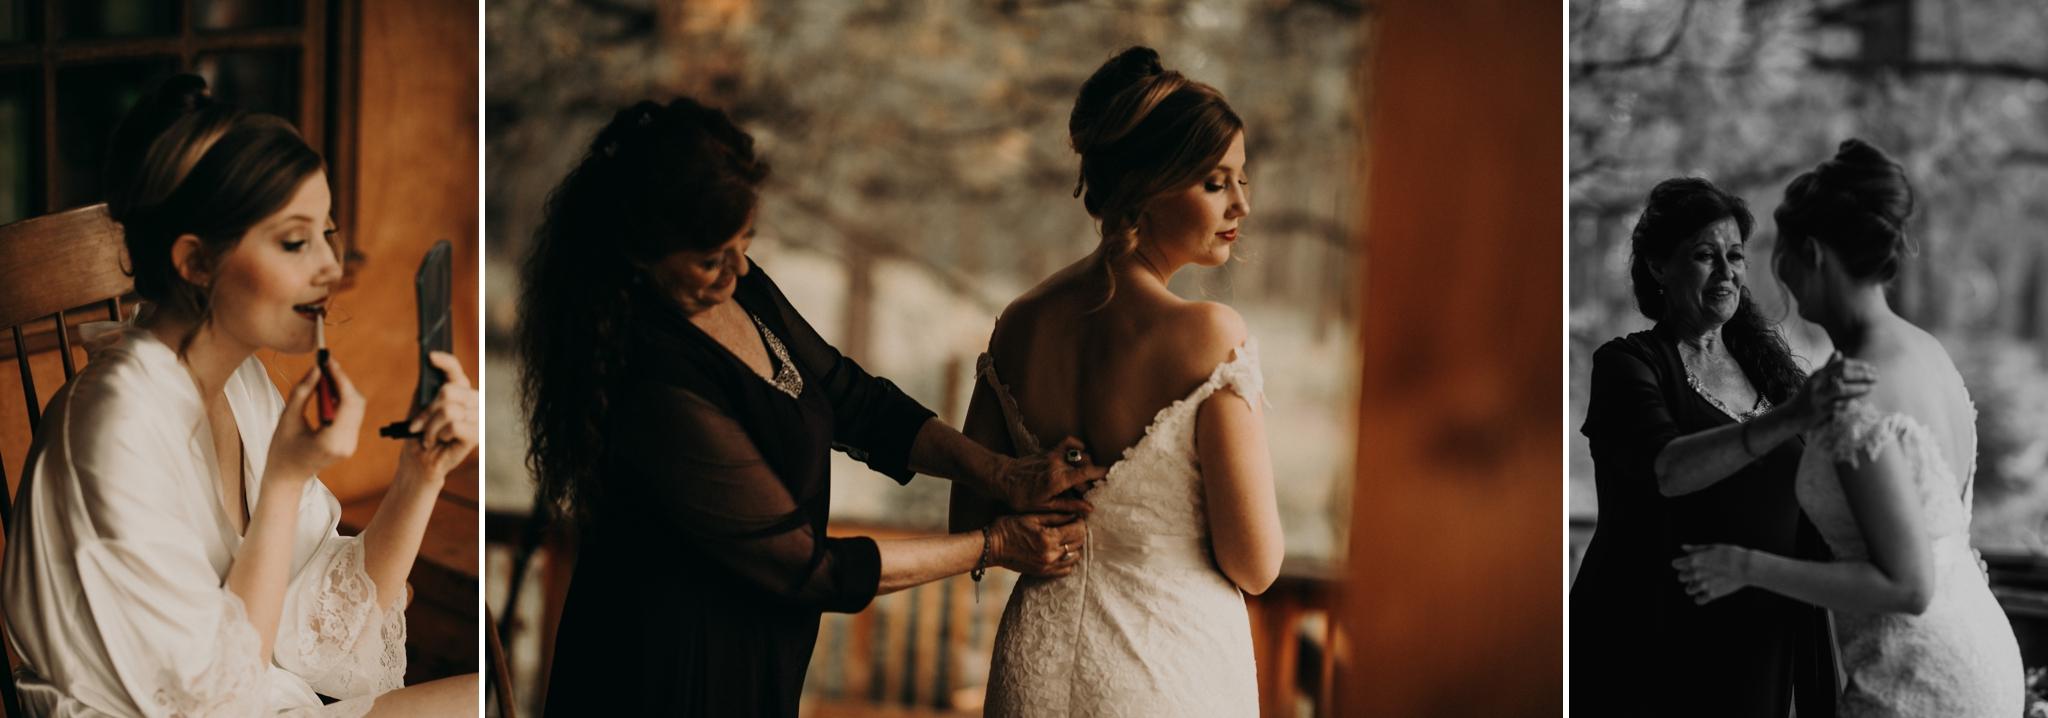 redwood-wedding2.jpg